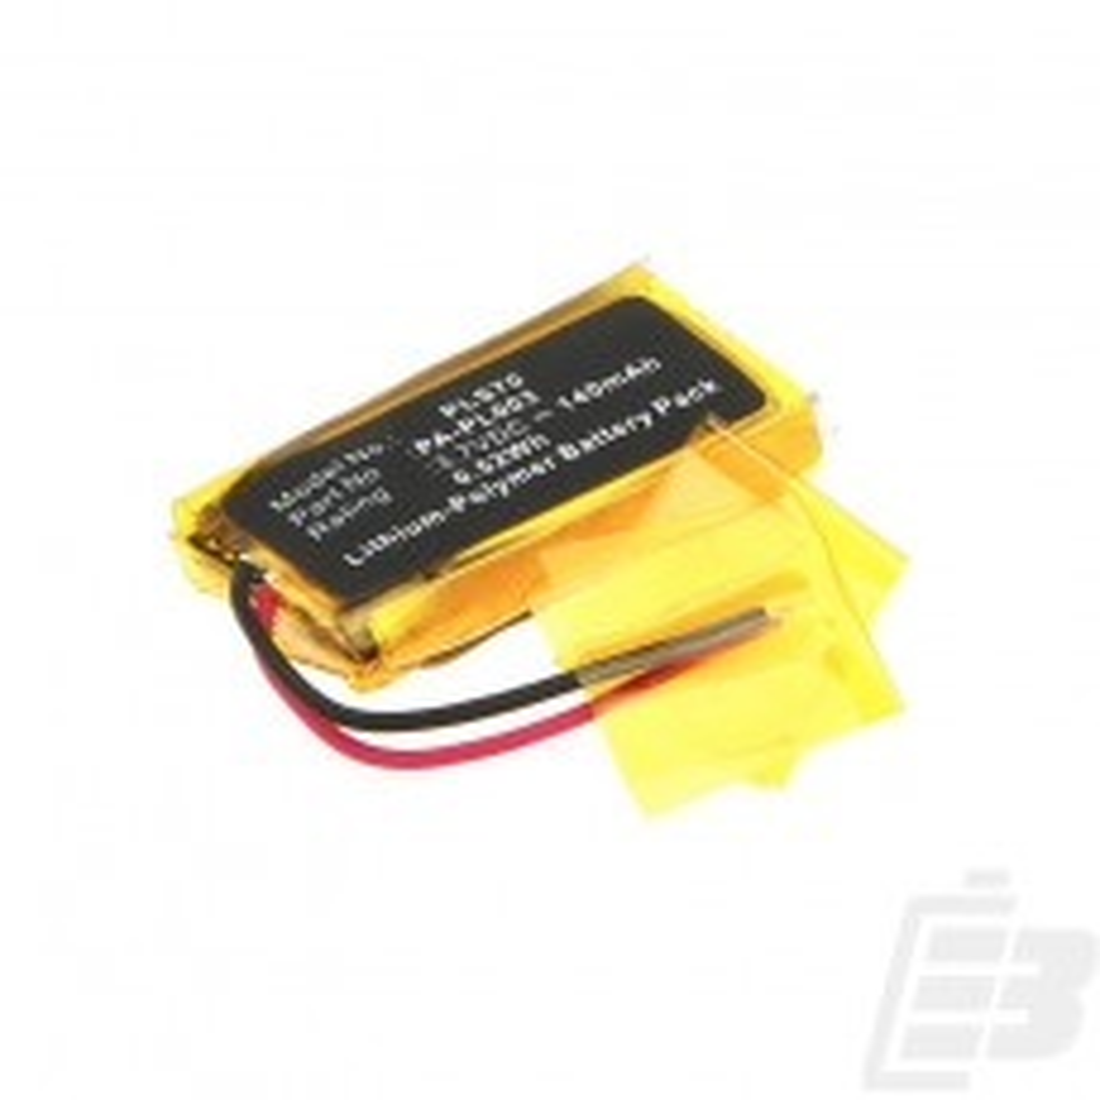 Wireless headset battery Plantronics Voyager Pro